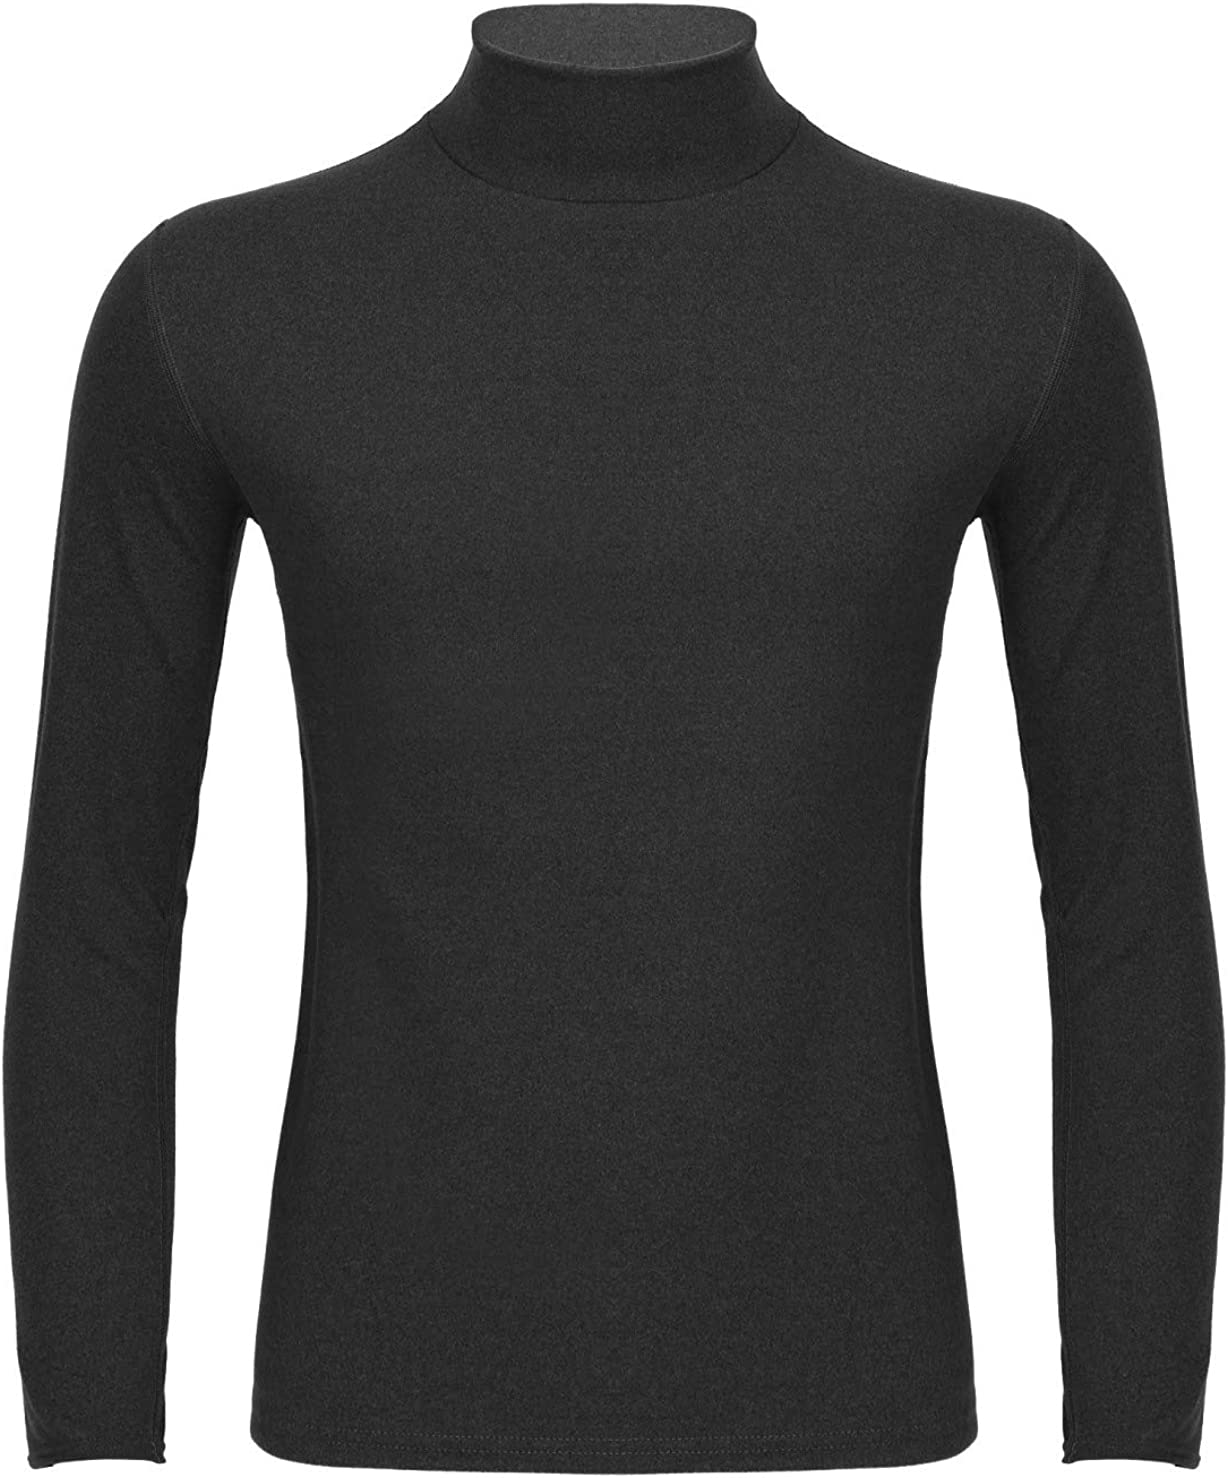 Haitryli Men's Casual Turtleneck Long Sleeve Thermal Underwear Tops Undershirt Base Layer Shirts